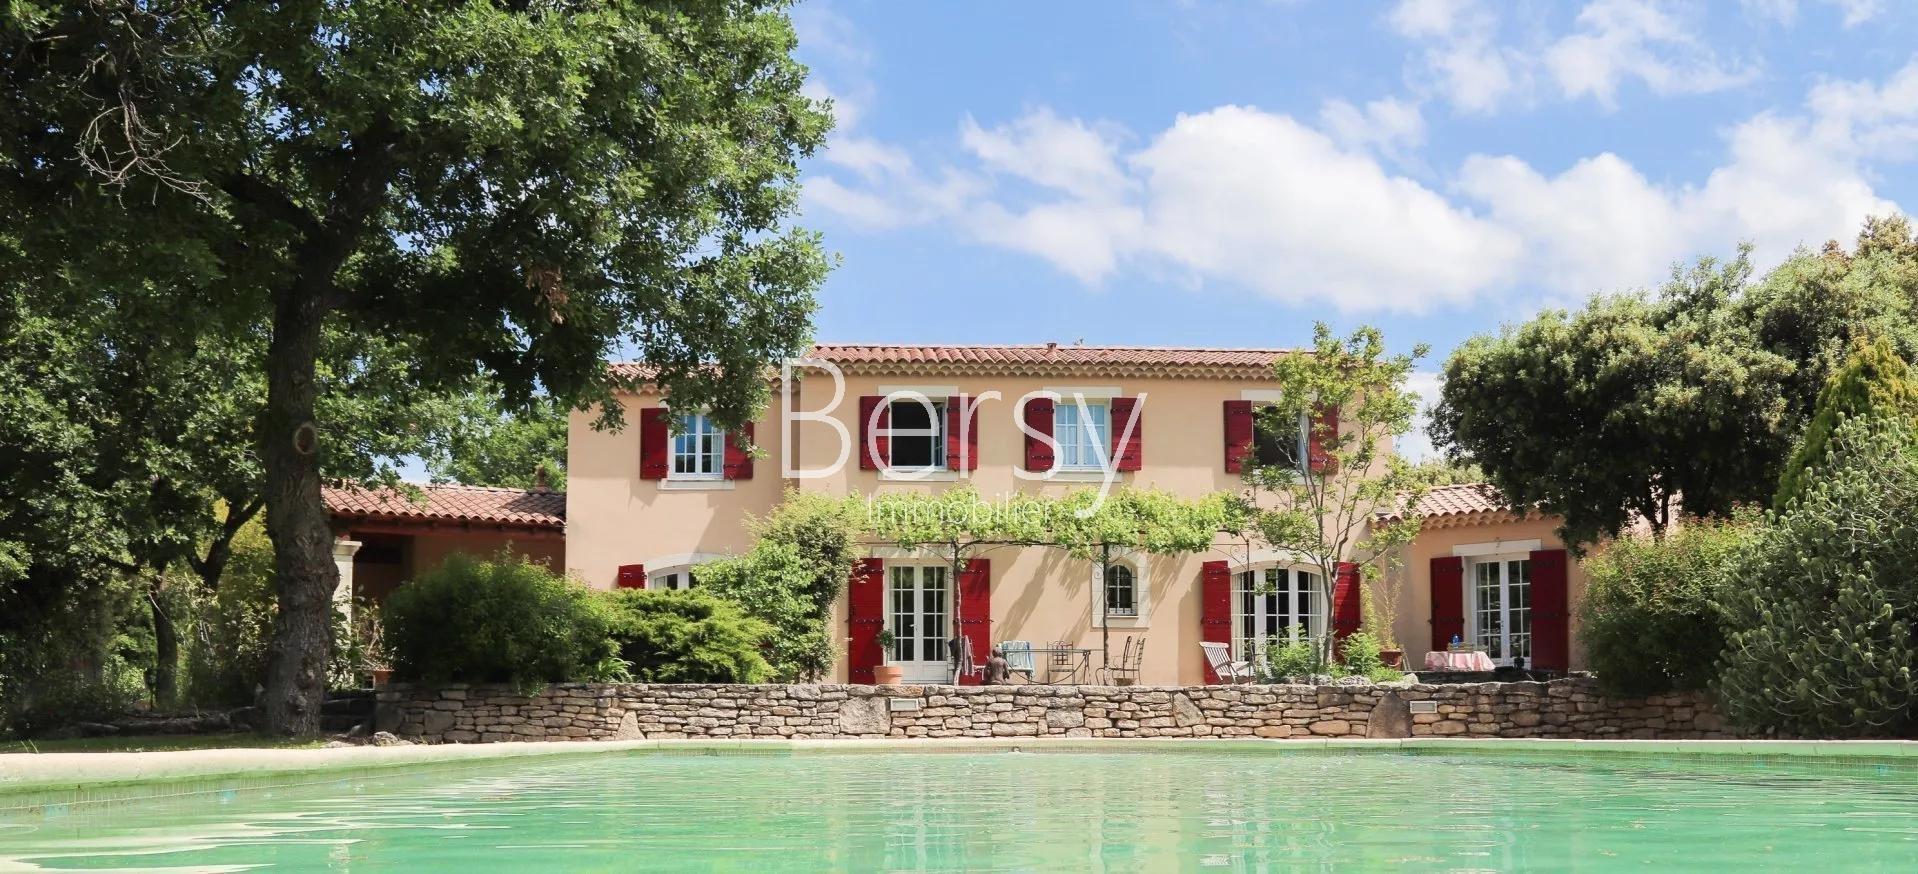 TROP TARD, C'EST VENDU !  - Bastide Provençale de 205m2 sur 2130 m2 de terrain